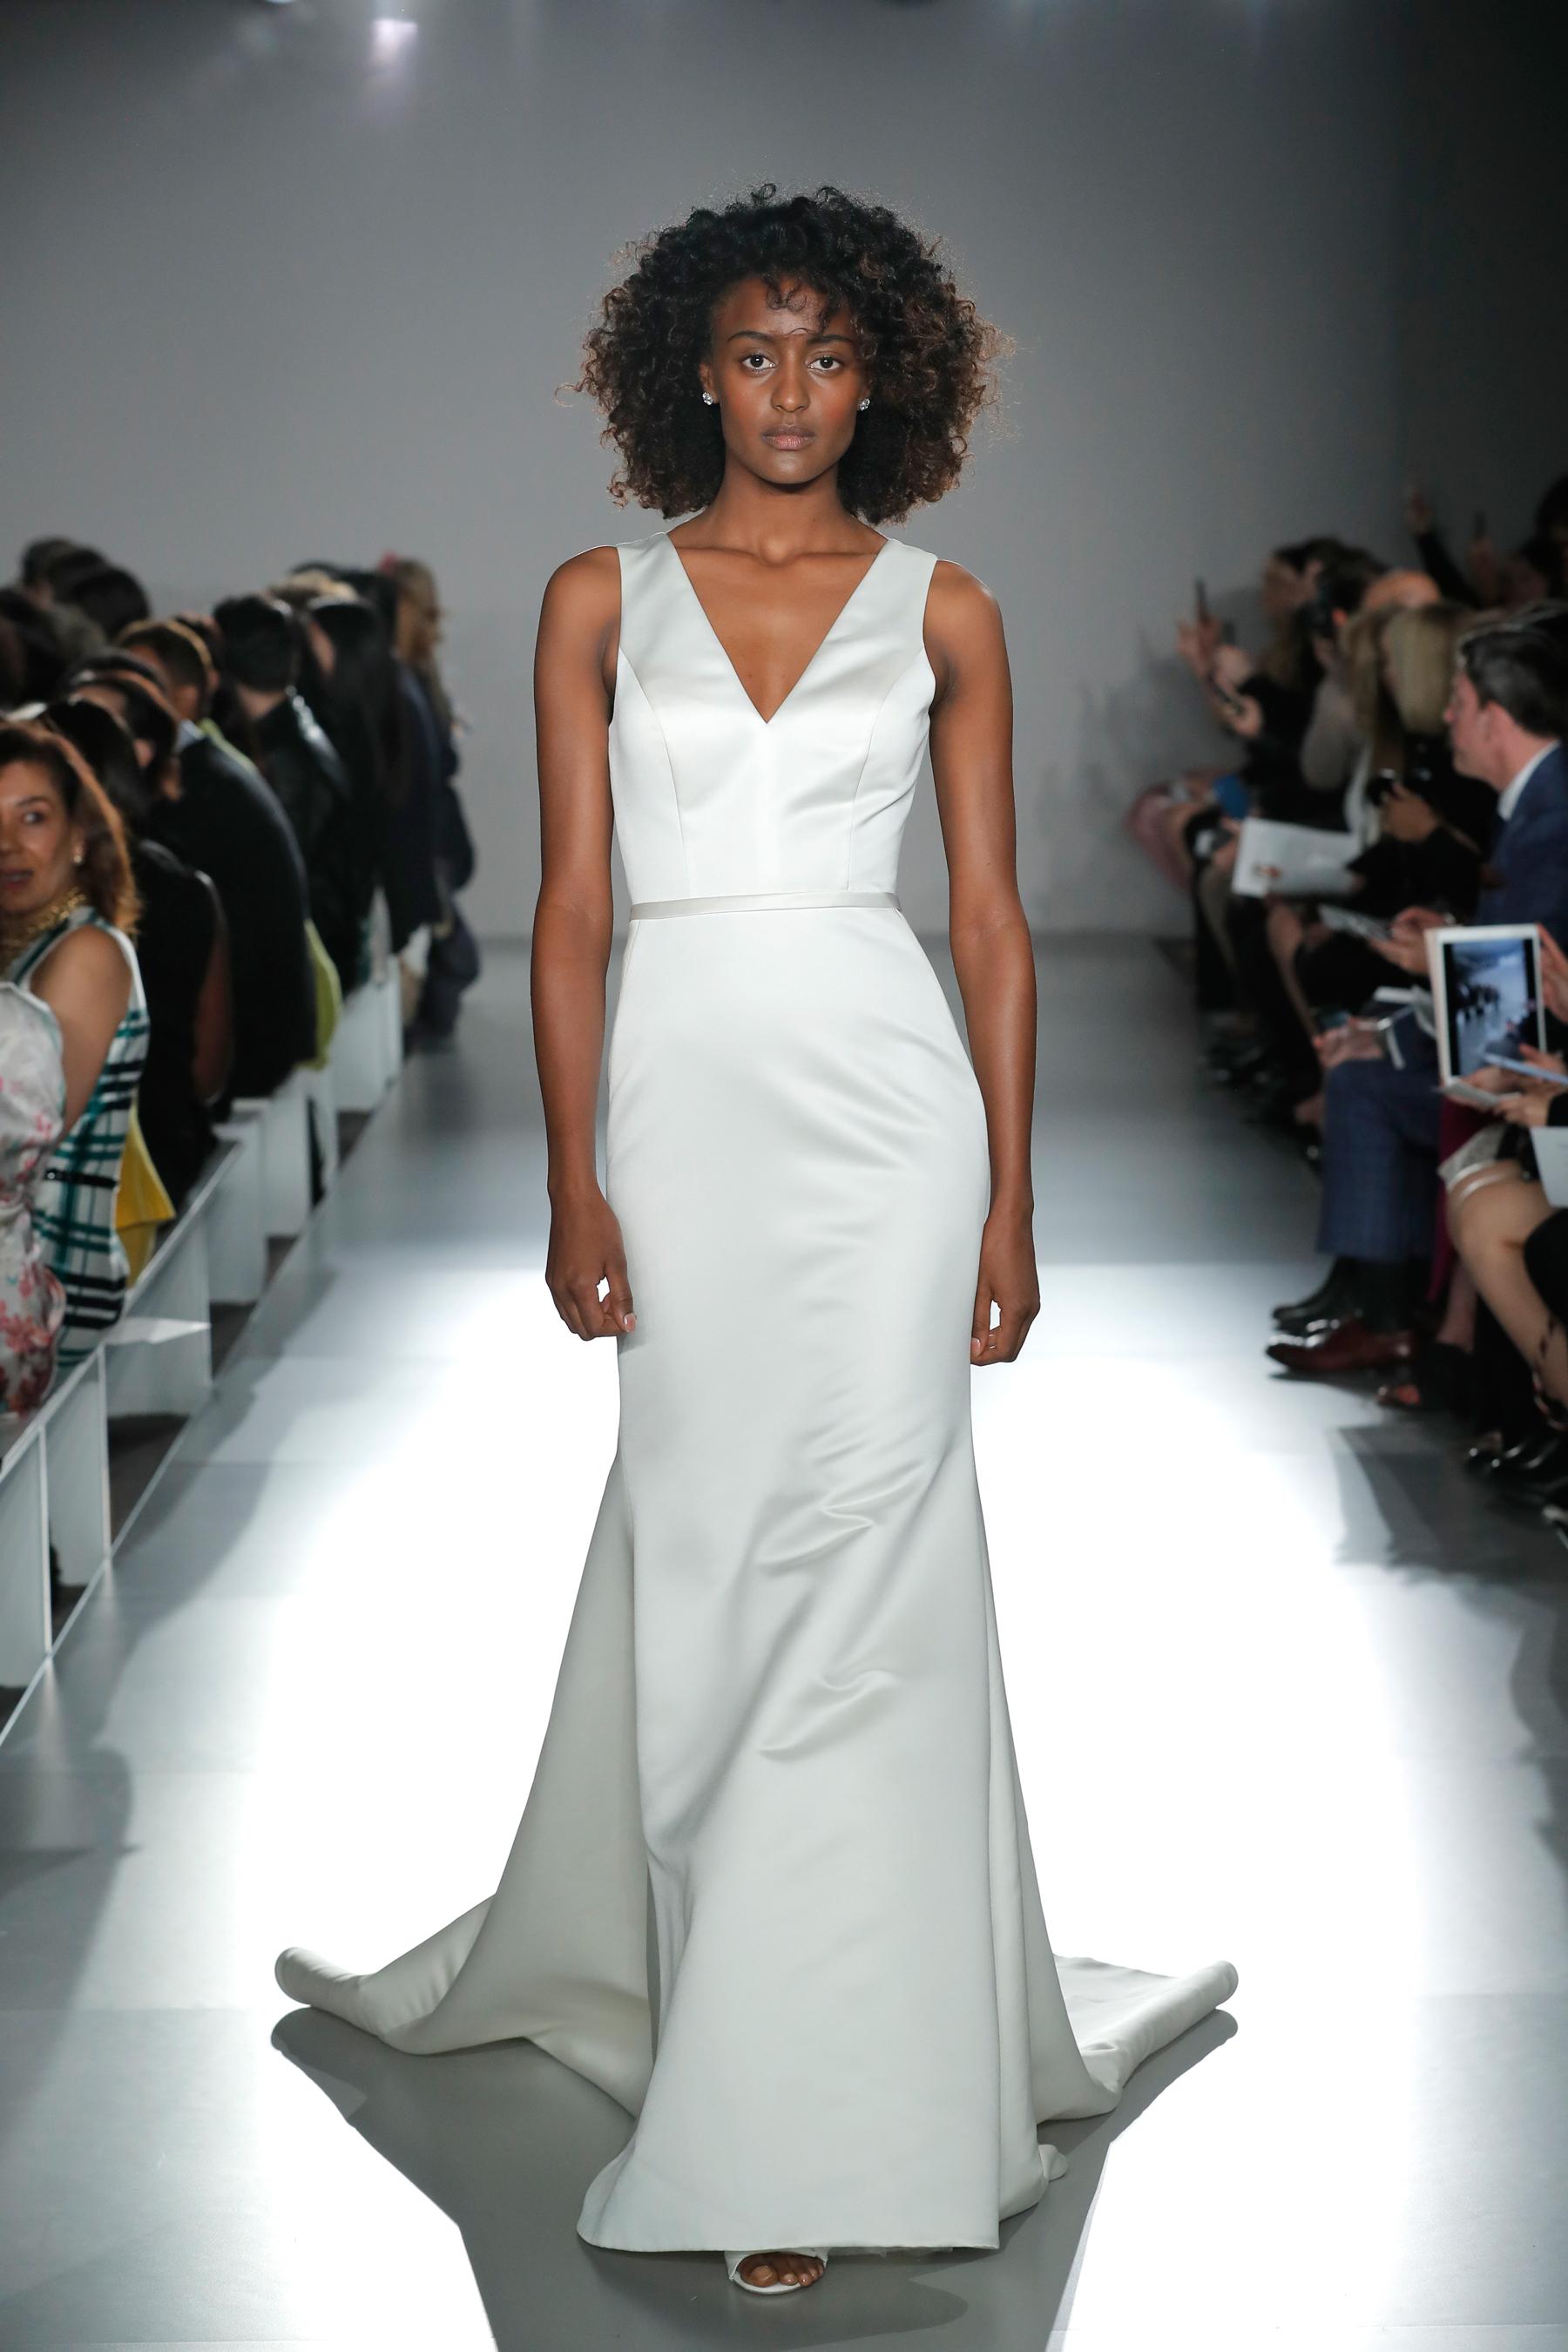 nouvelle amsale sleeveless v-neck sheath wedding dress with train spring 2020